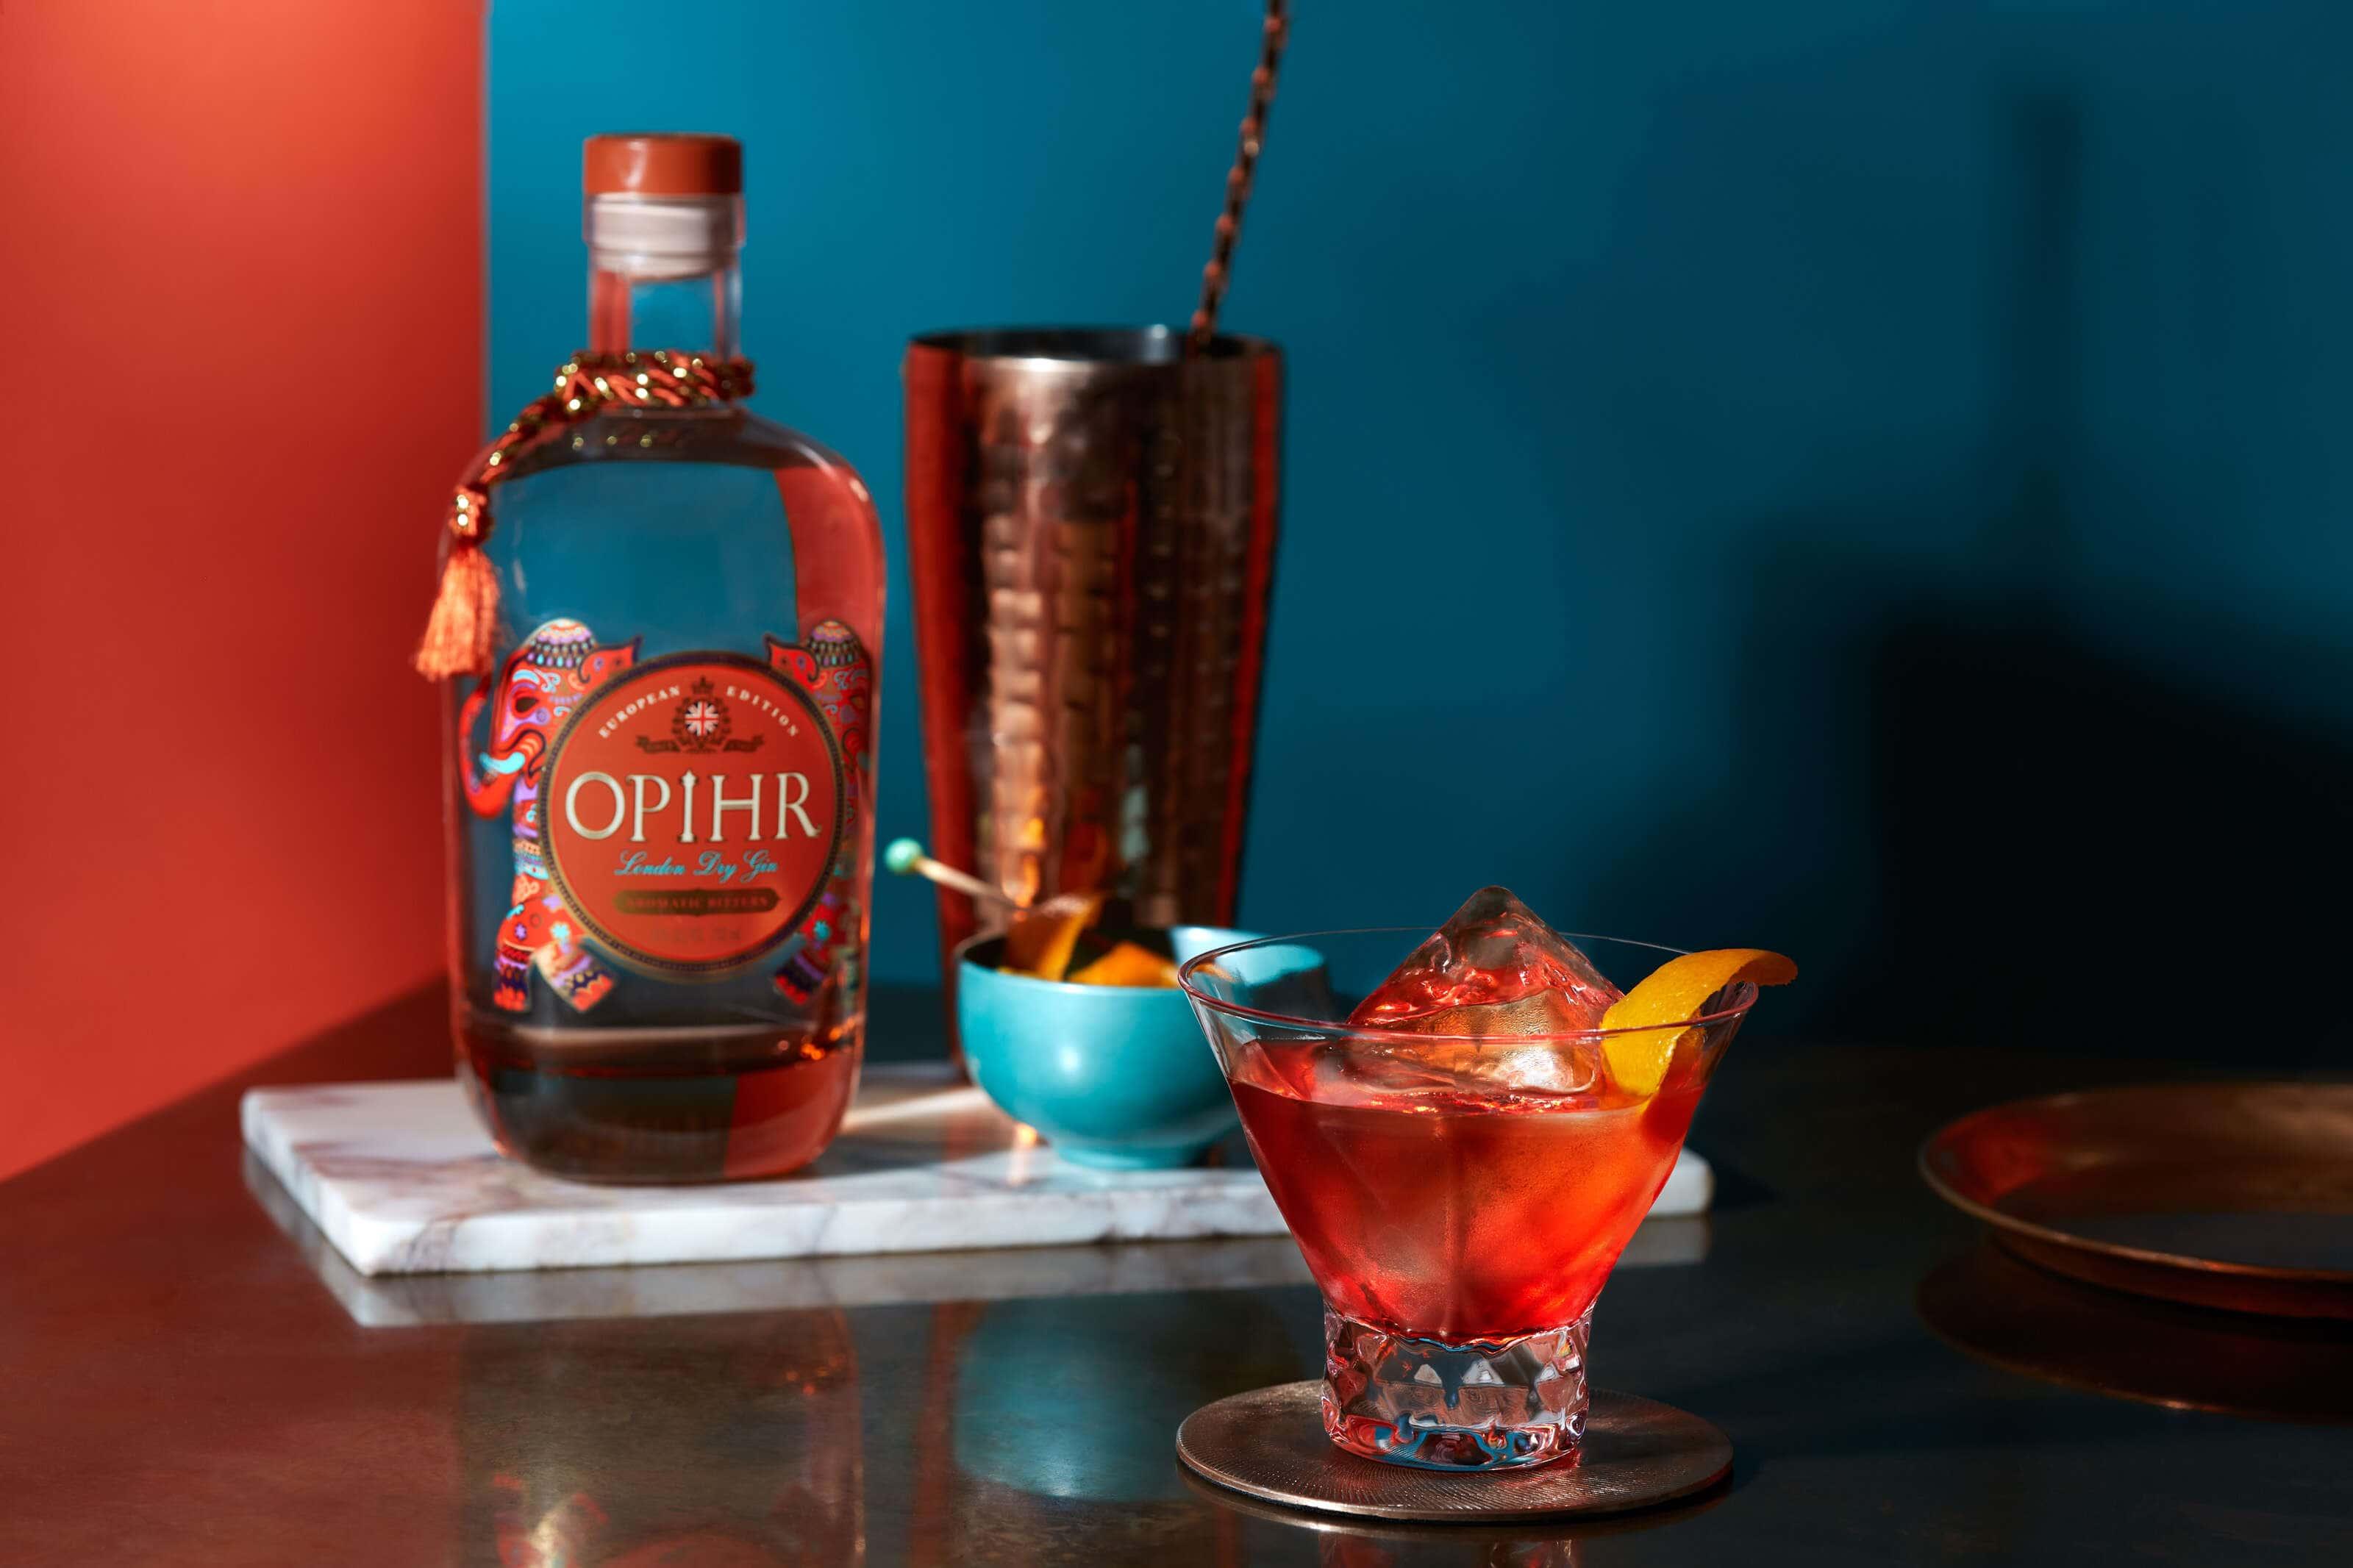 Opihr Gin European Spiced Negroni